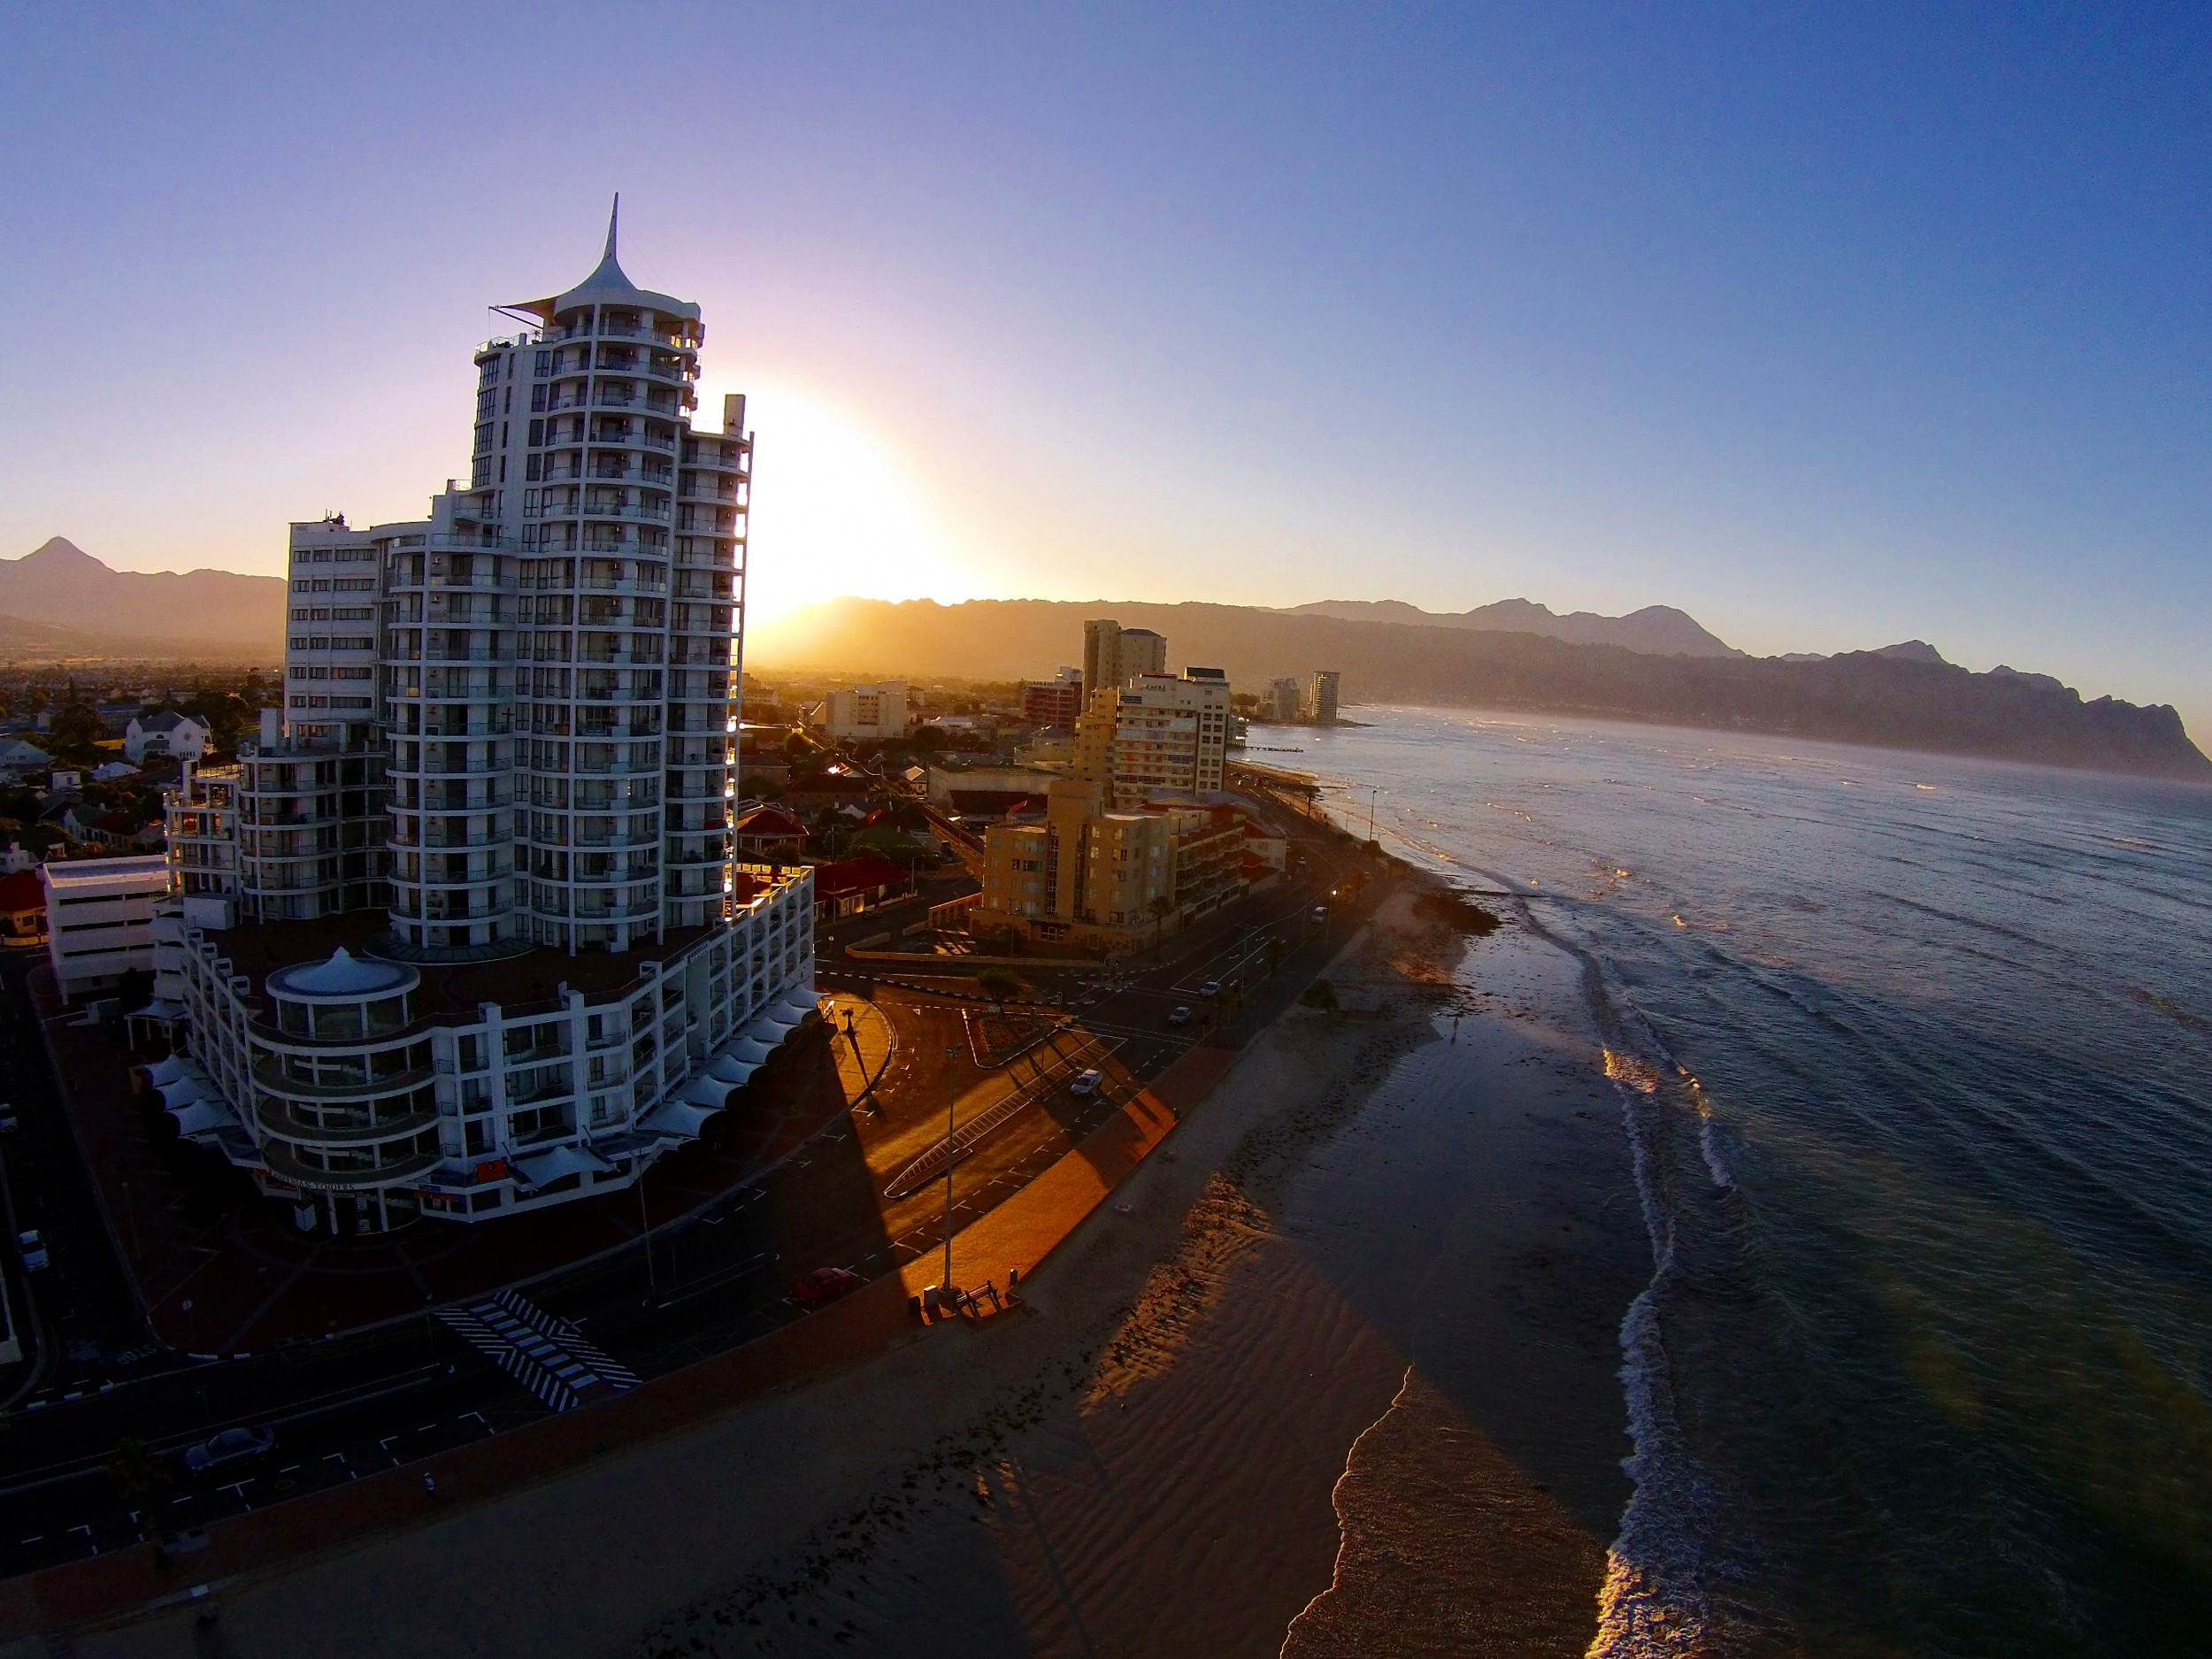 Strand Beachfront, Western Cape, South Africa